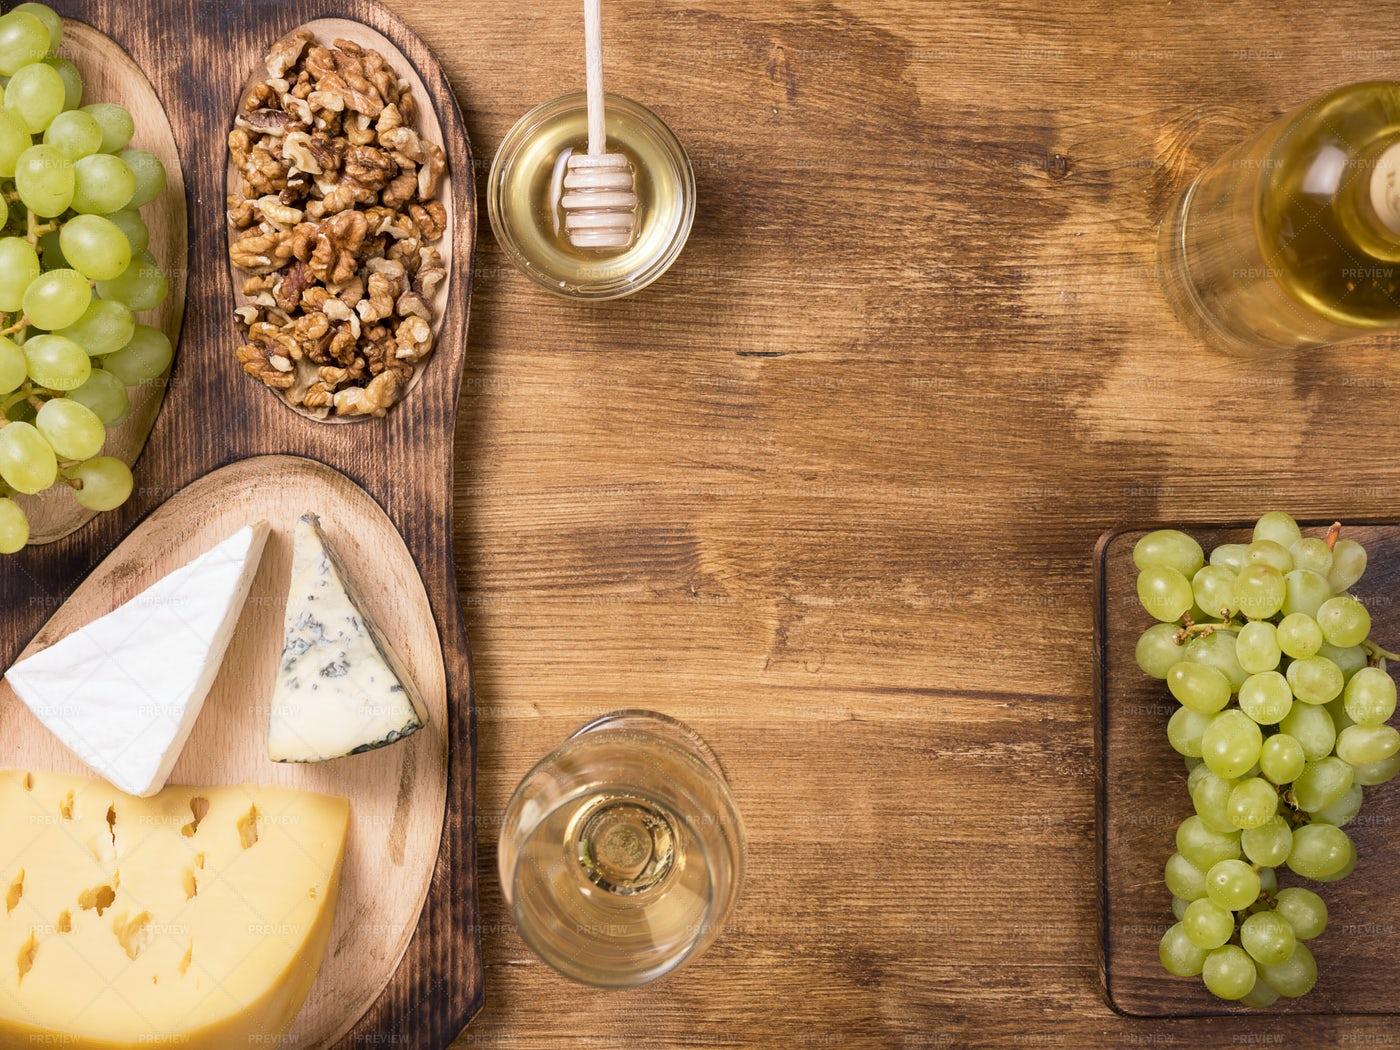 Wine Tasting Background: Stock Photos